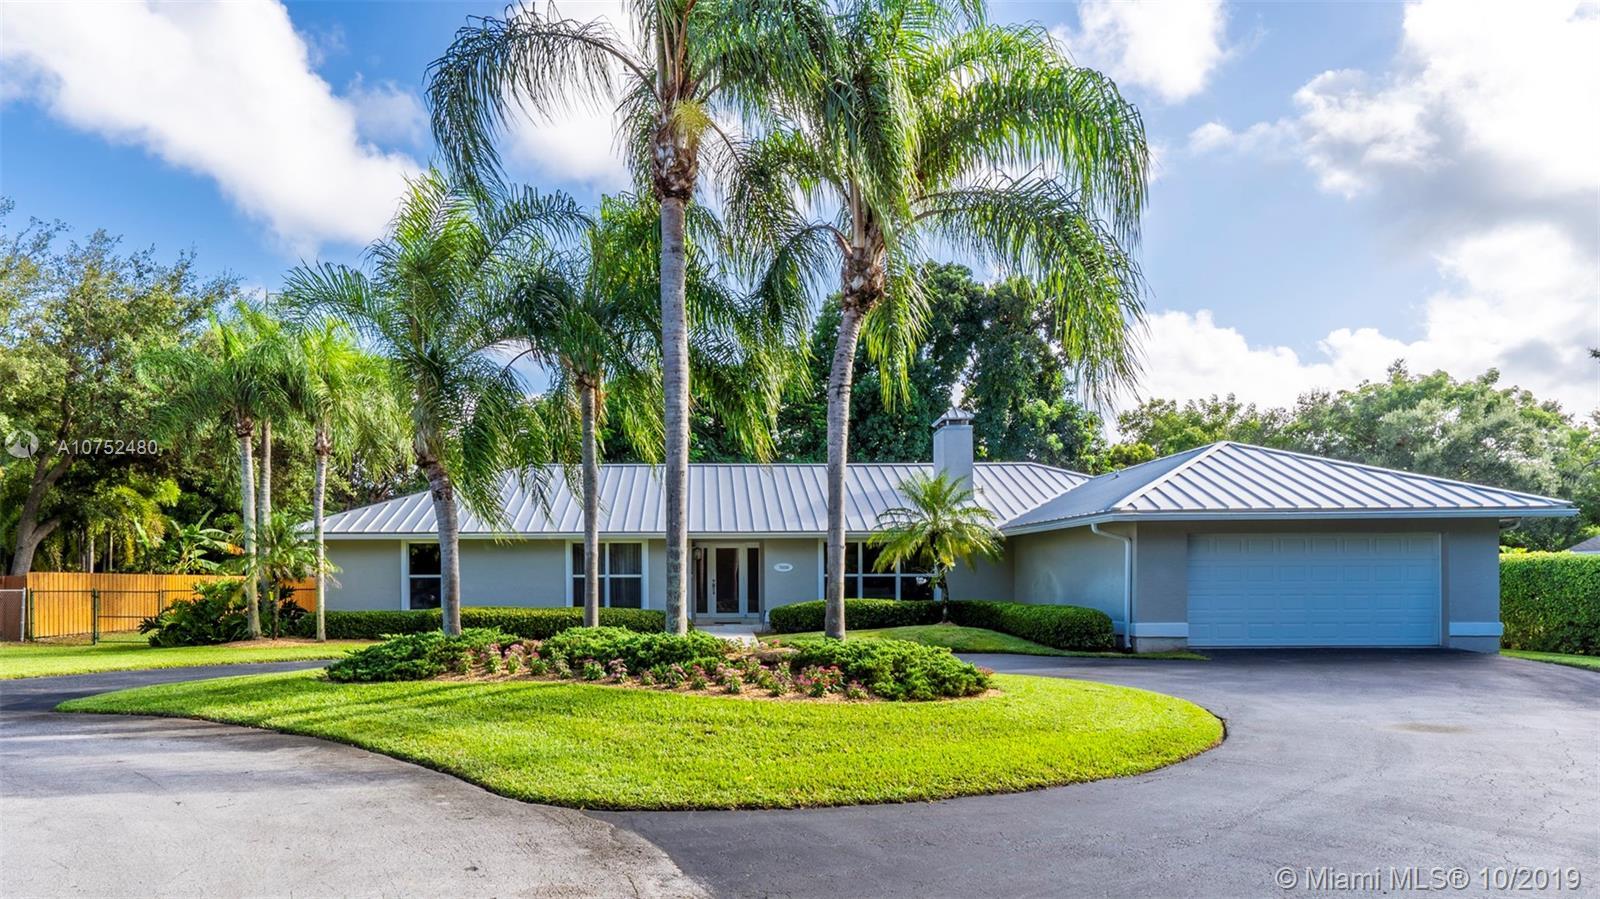 7930 SW 155th St, Palmetto Bay, FL 33157